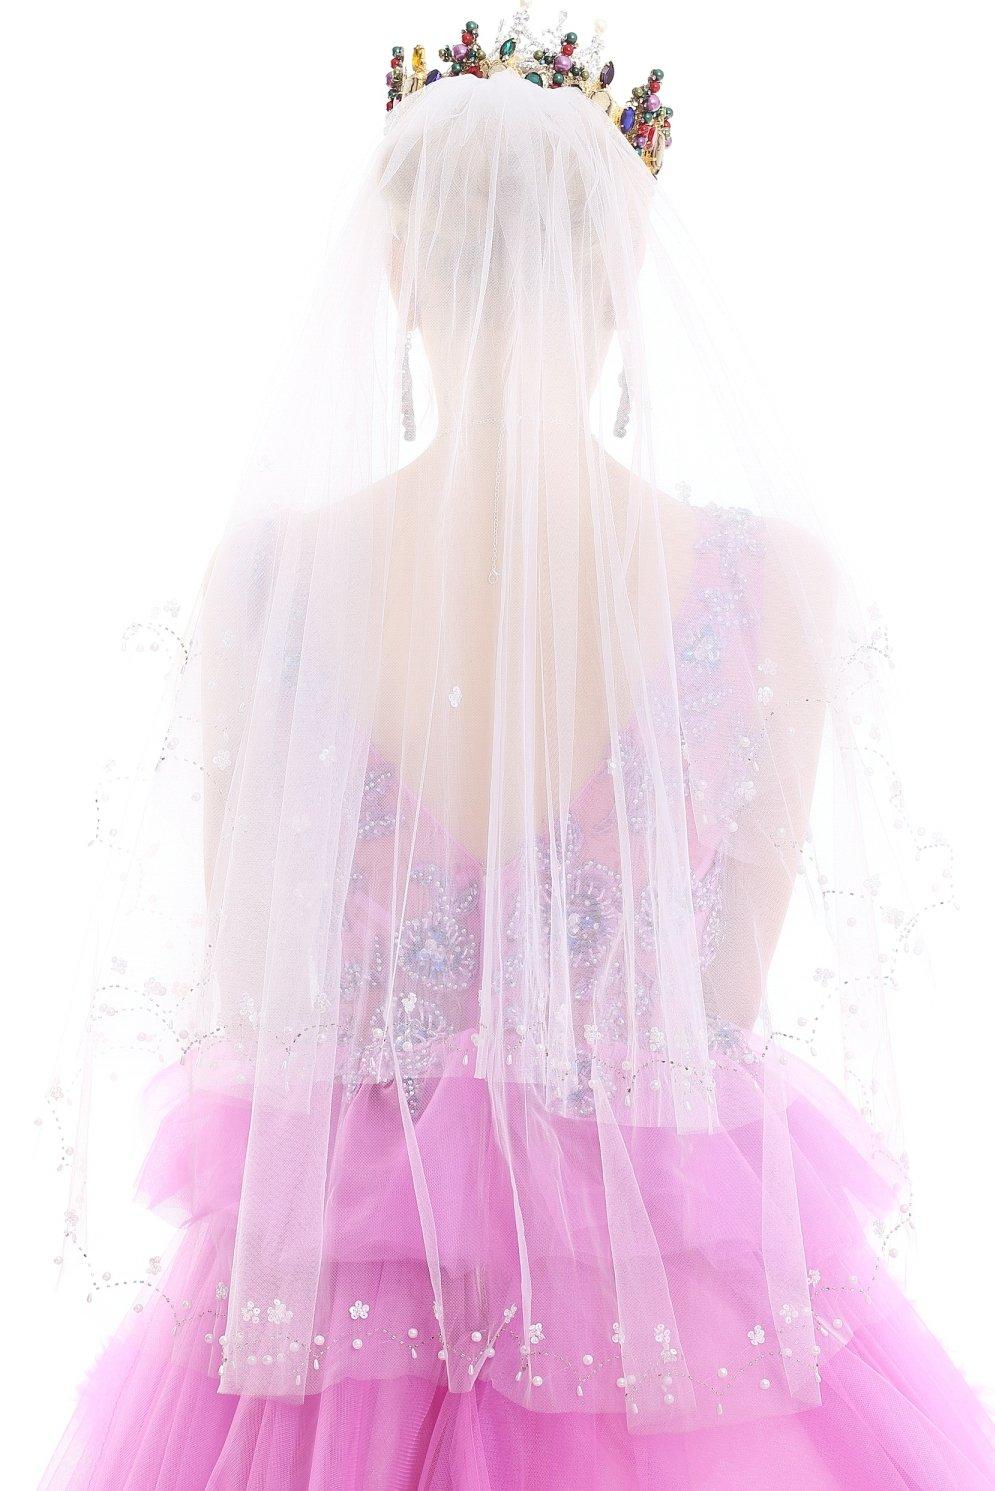 Pop-Fashion Women's 2T 2 Tie Ivory Birdcage Veil Bridal Fascinator Bridal Veil Ivory Elbow Crystals 117 (White)